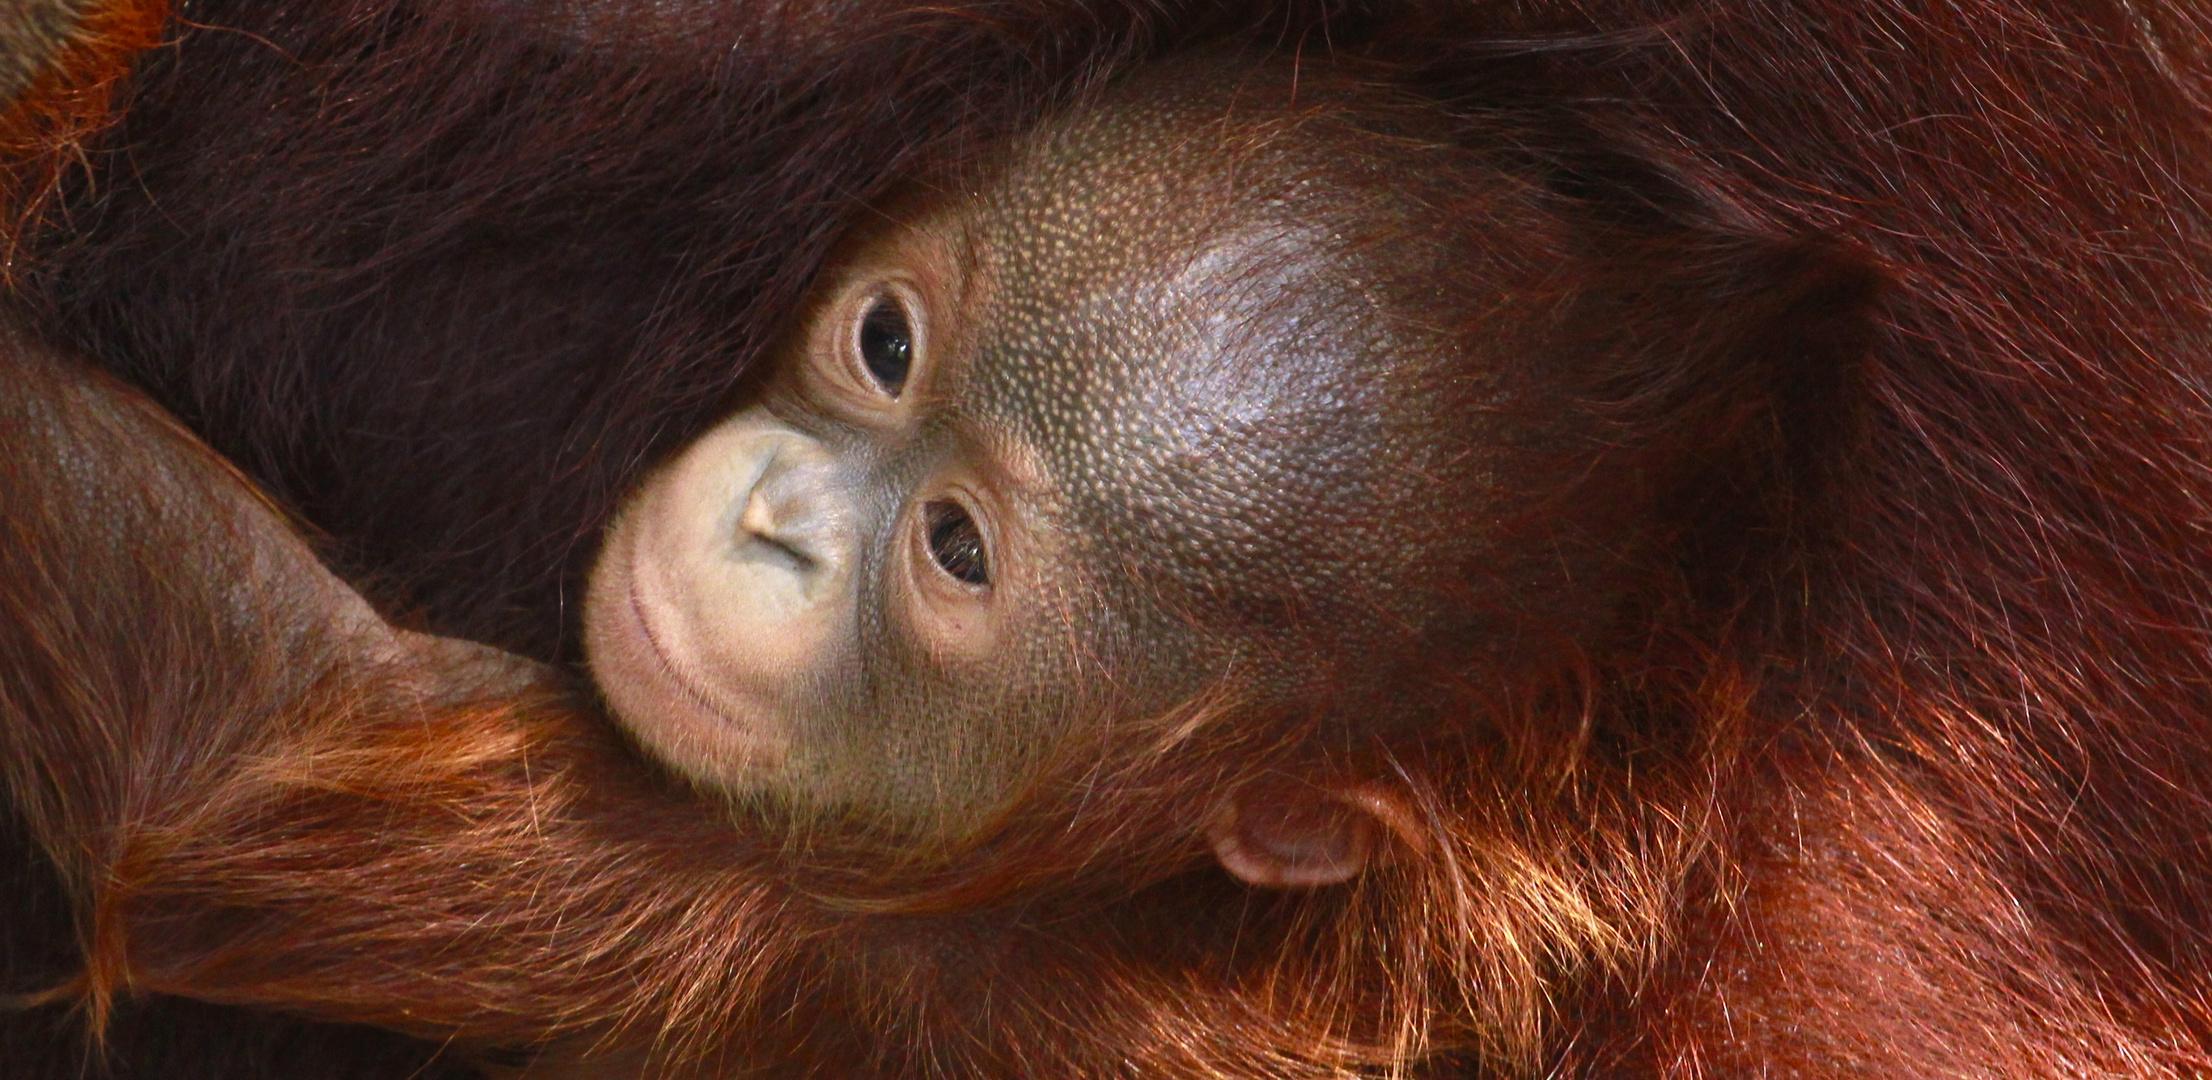 Orang utan/Menschenaffen